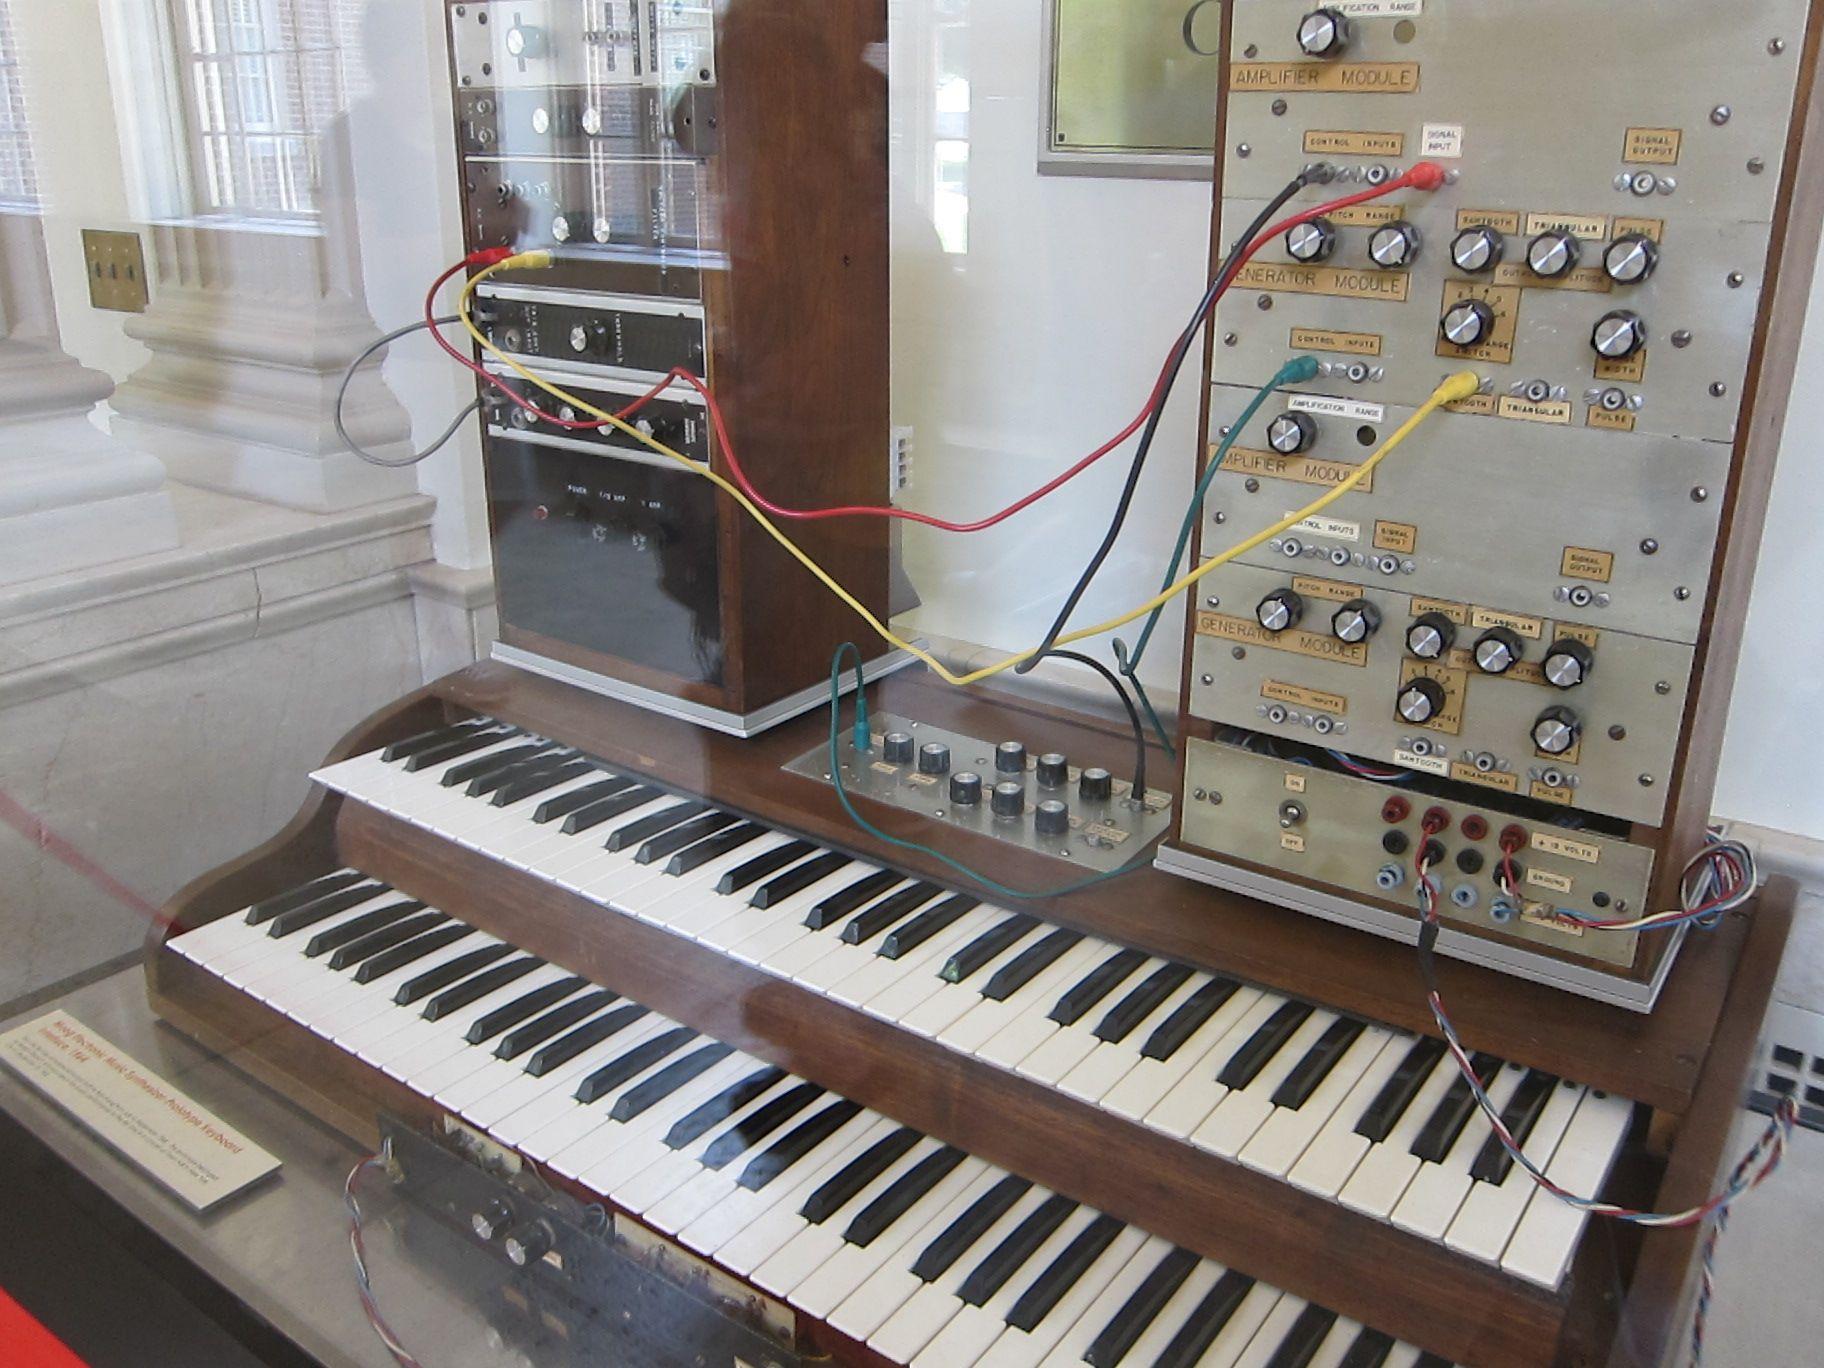 Herb Deutsch and the First Moog at Maker Faire Detroit